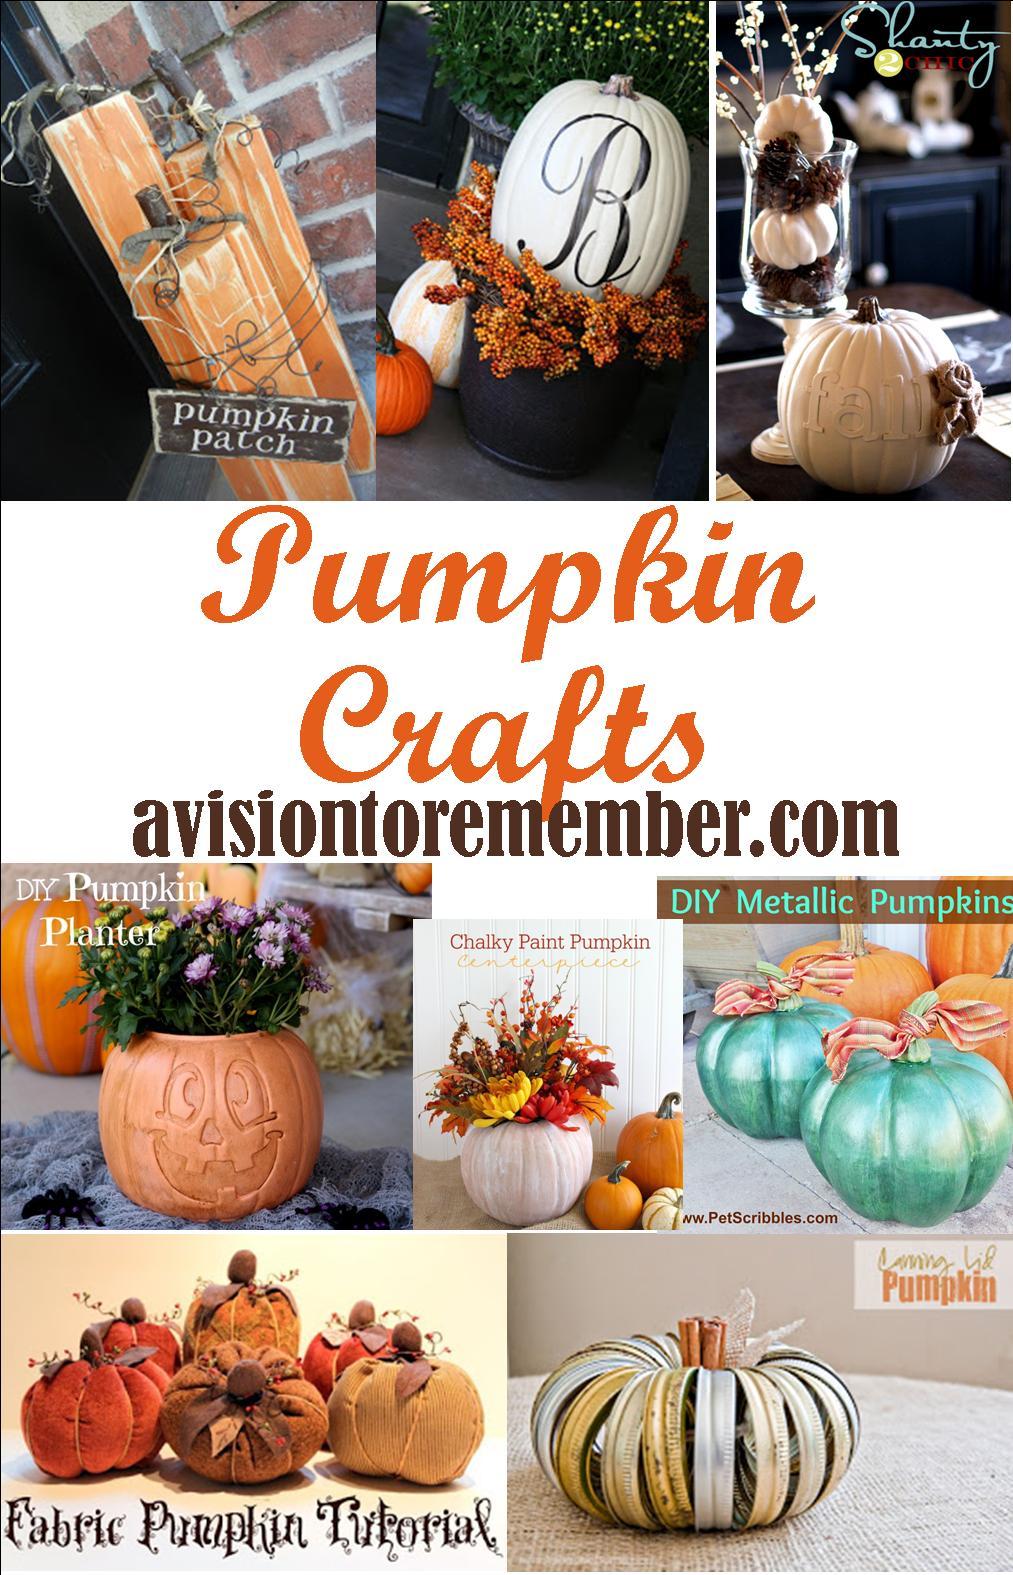 pumpkin crafts ideas on avisiontoremember.com